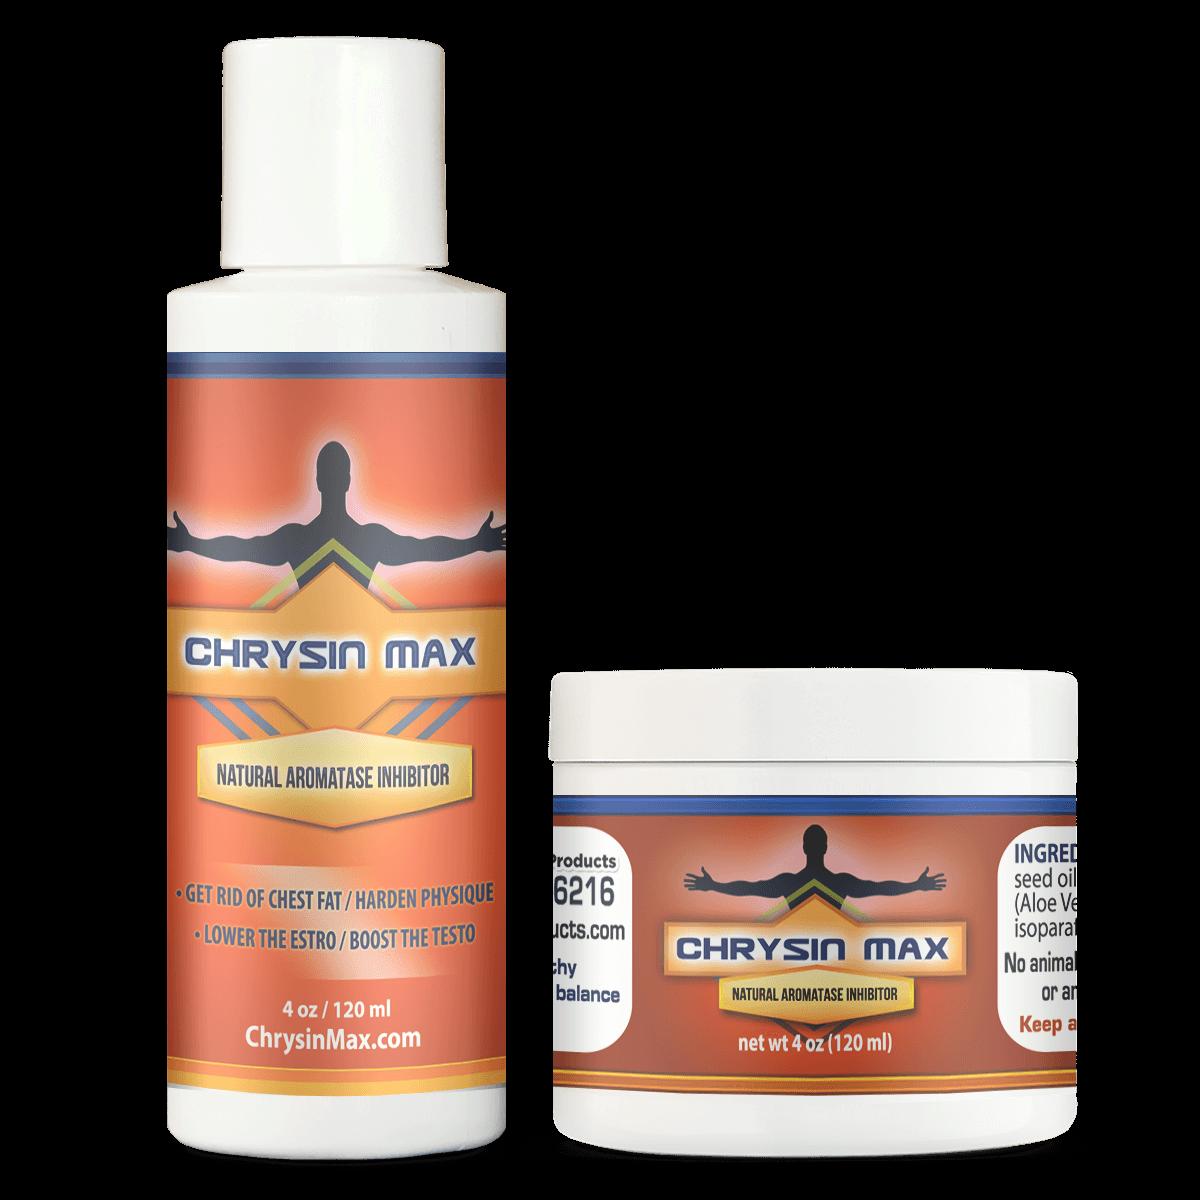 Chrysin Max Best Natural Aromatase Inhibitor Transdermal Cream